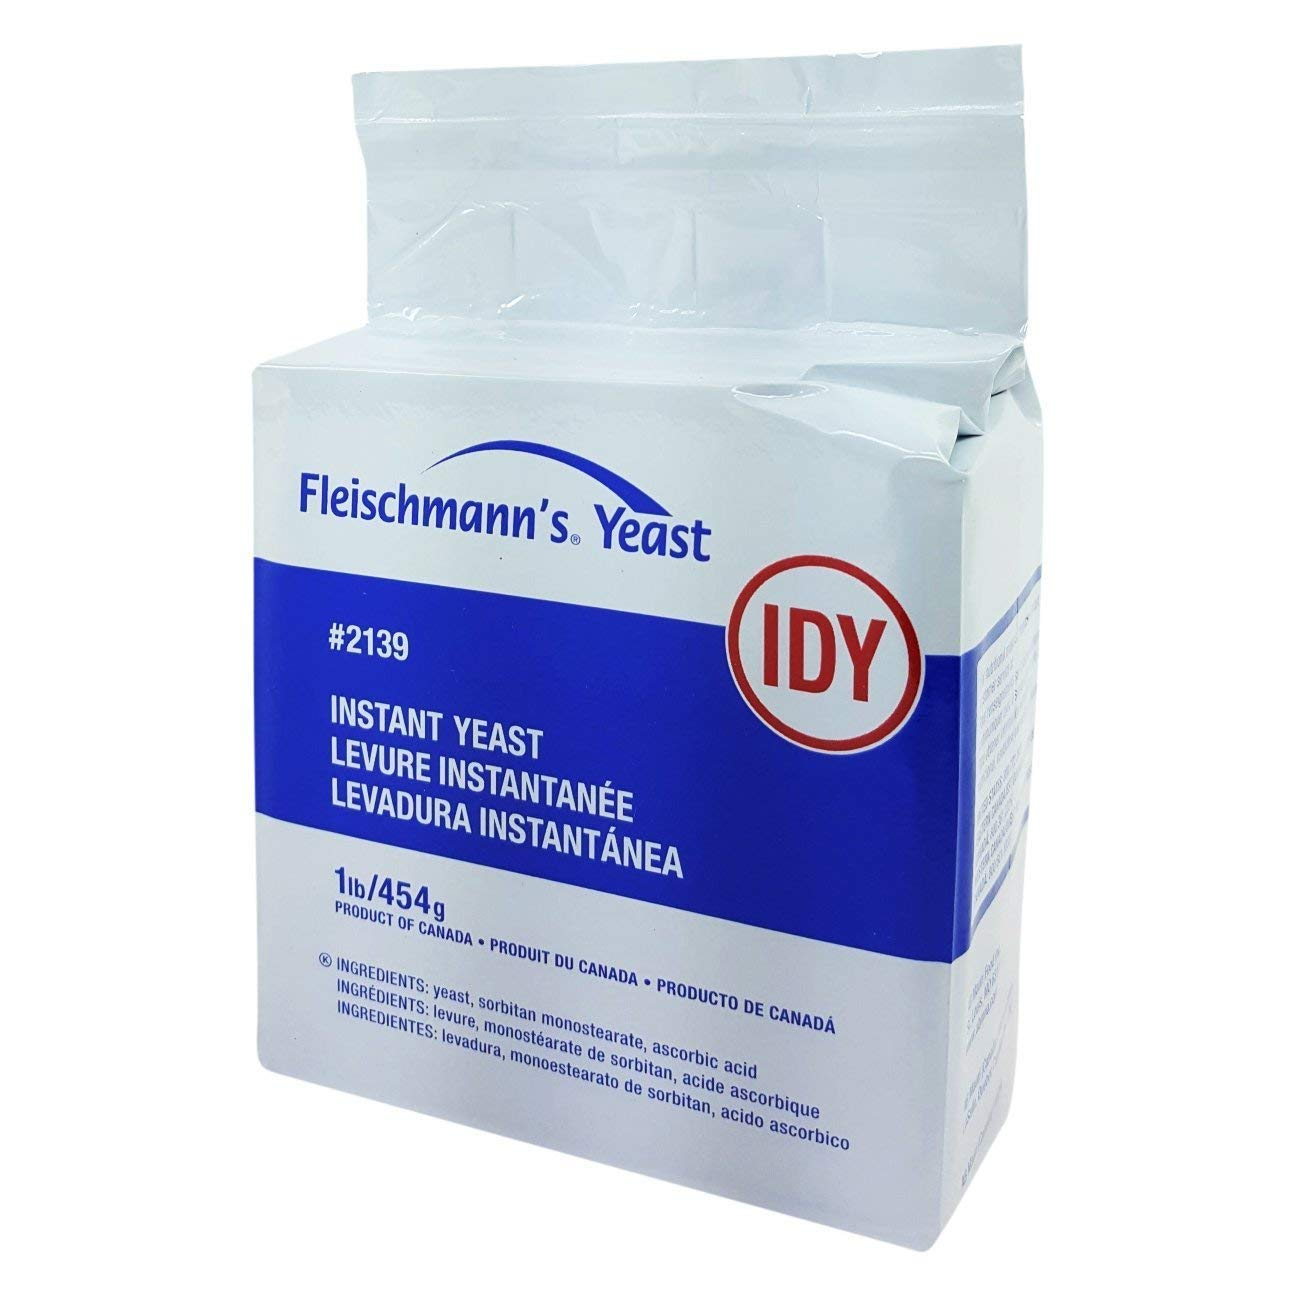 B000LRFVHE Fleischmann's Instant Dry Yeast 1lb bag 61hknuv77qL